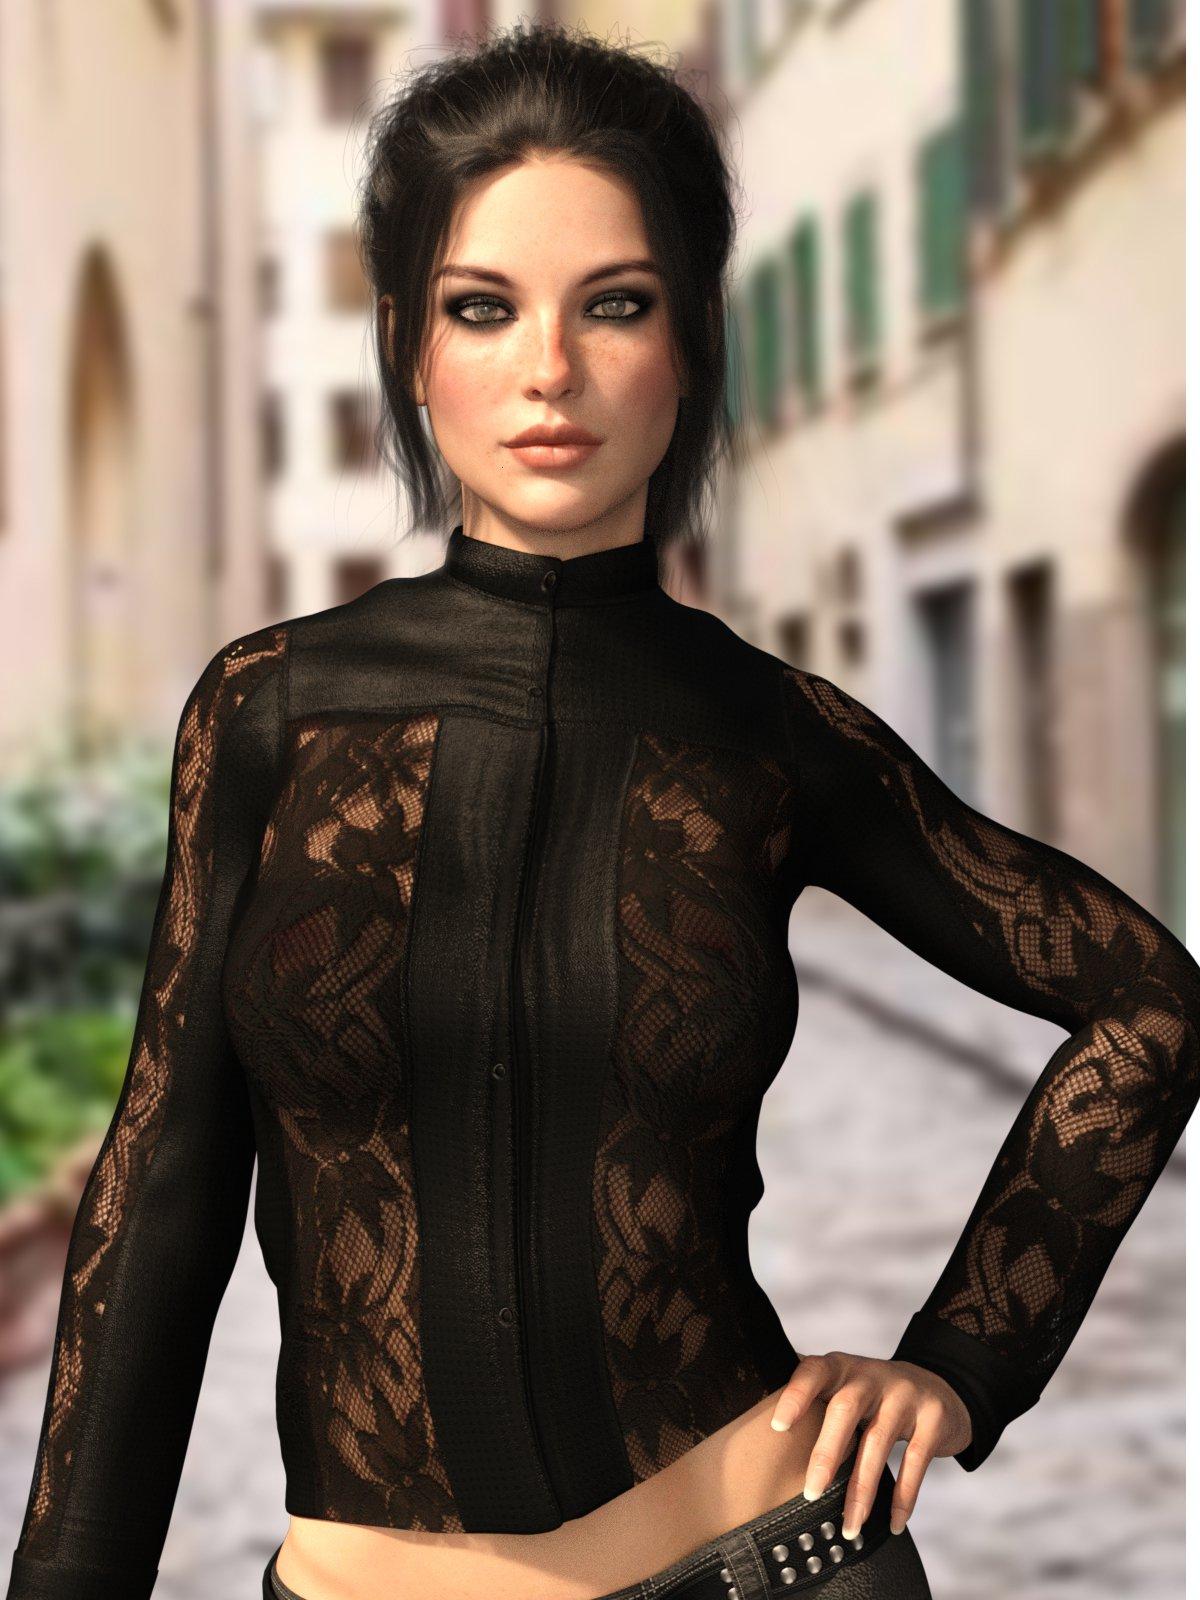 X-Fashion L&L Jacket for Genesis 8 Females_DAZ3D下载站